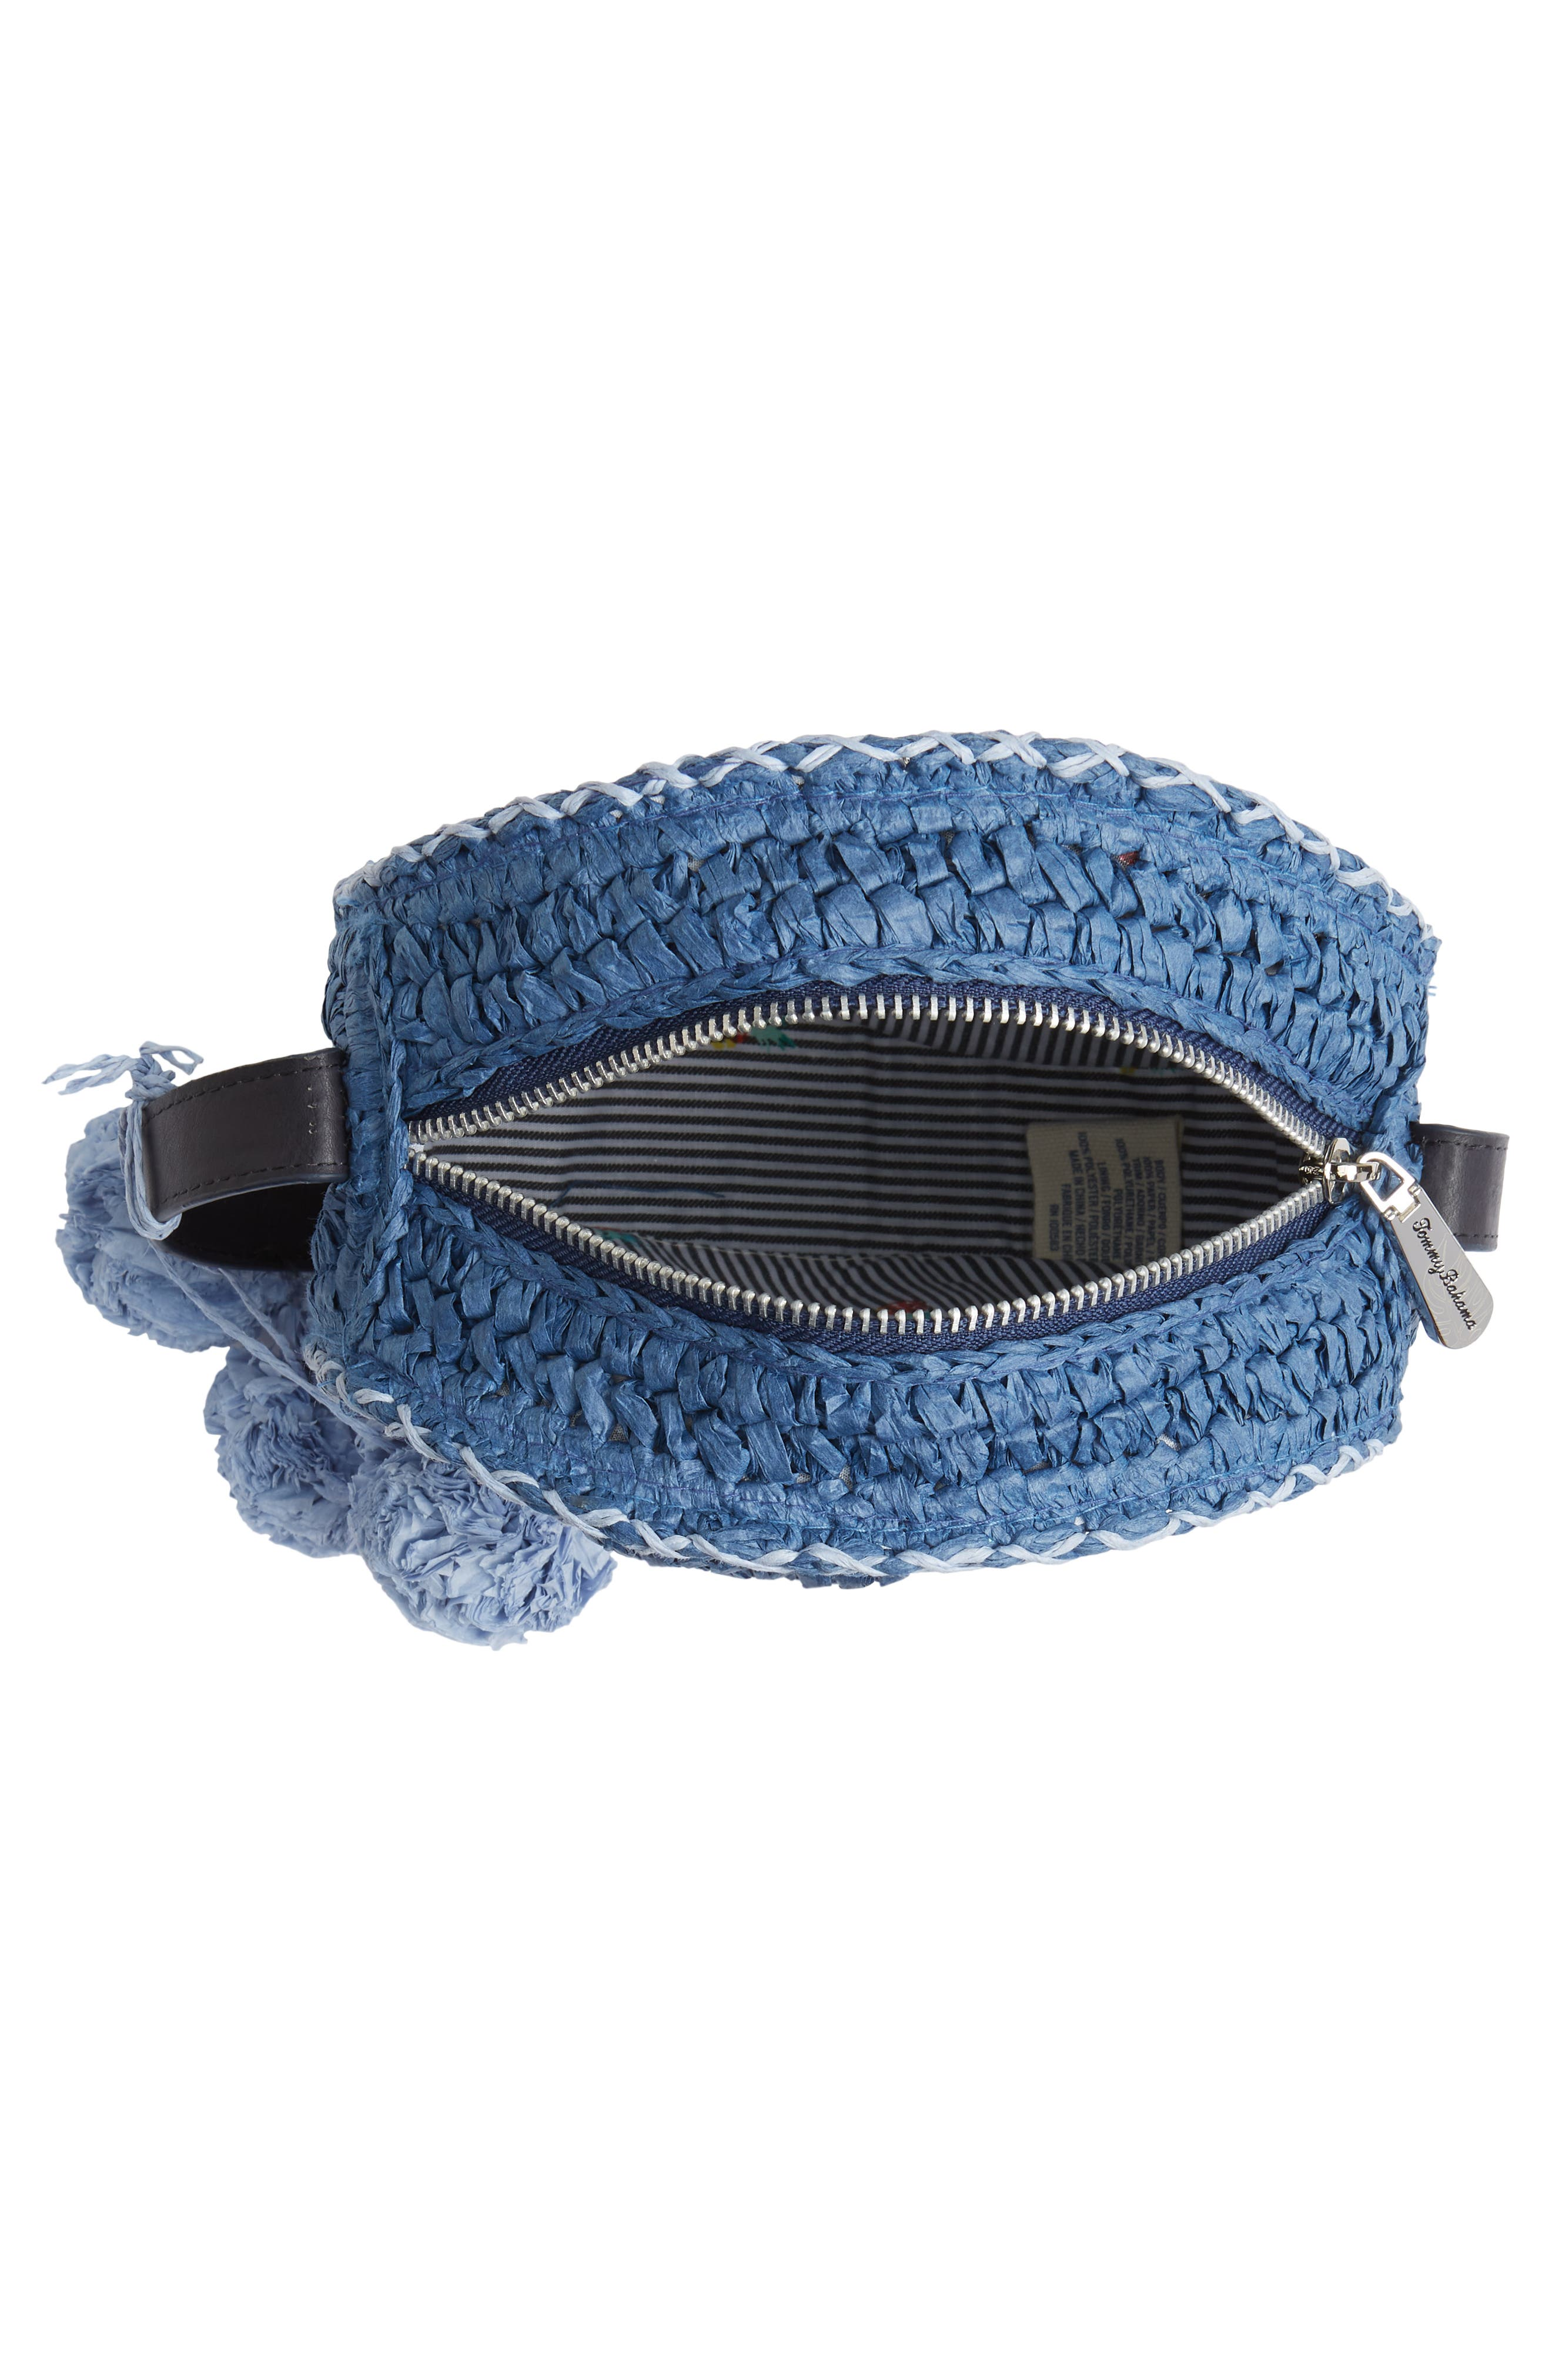 Pirro Woven Straw Crossbody Bag,                             Alternate thumbnail 4, color,                             Navy